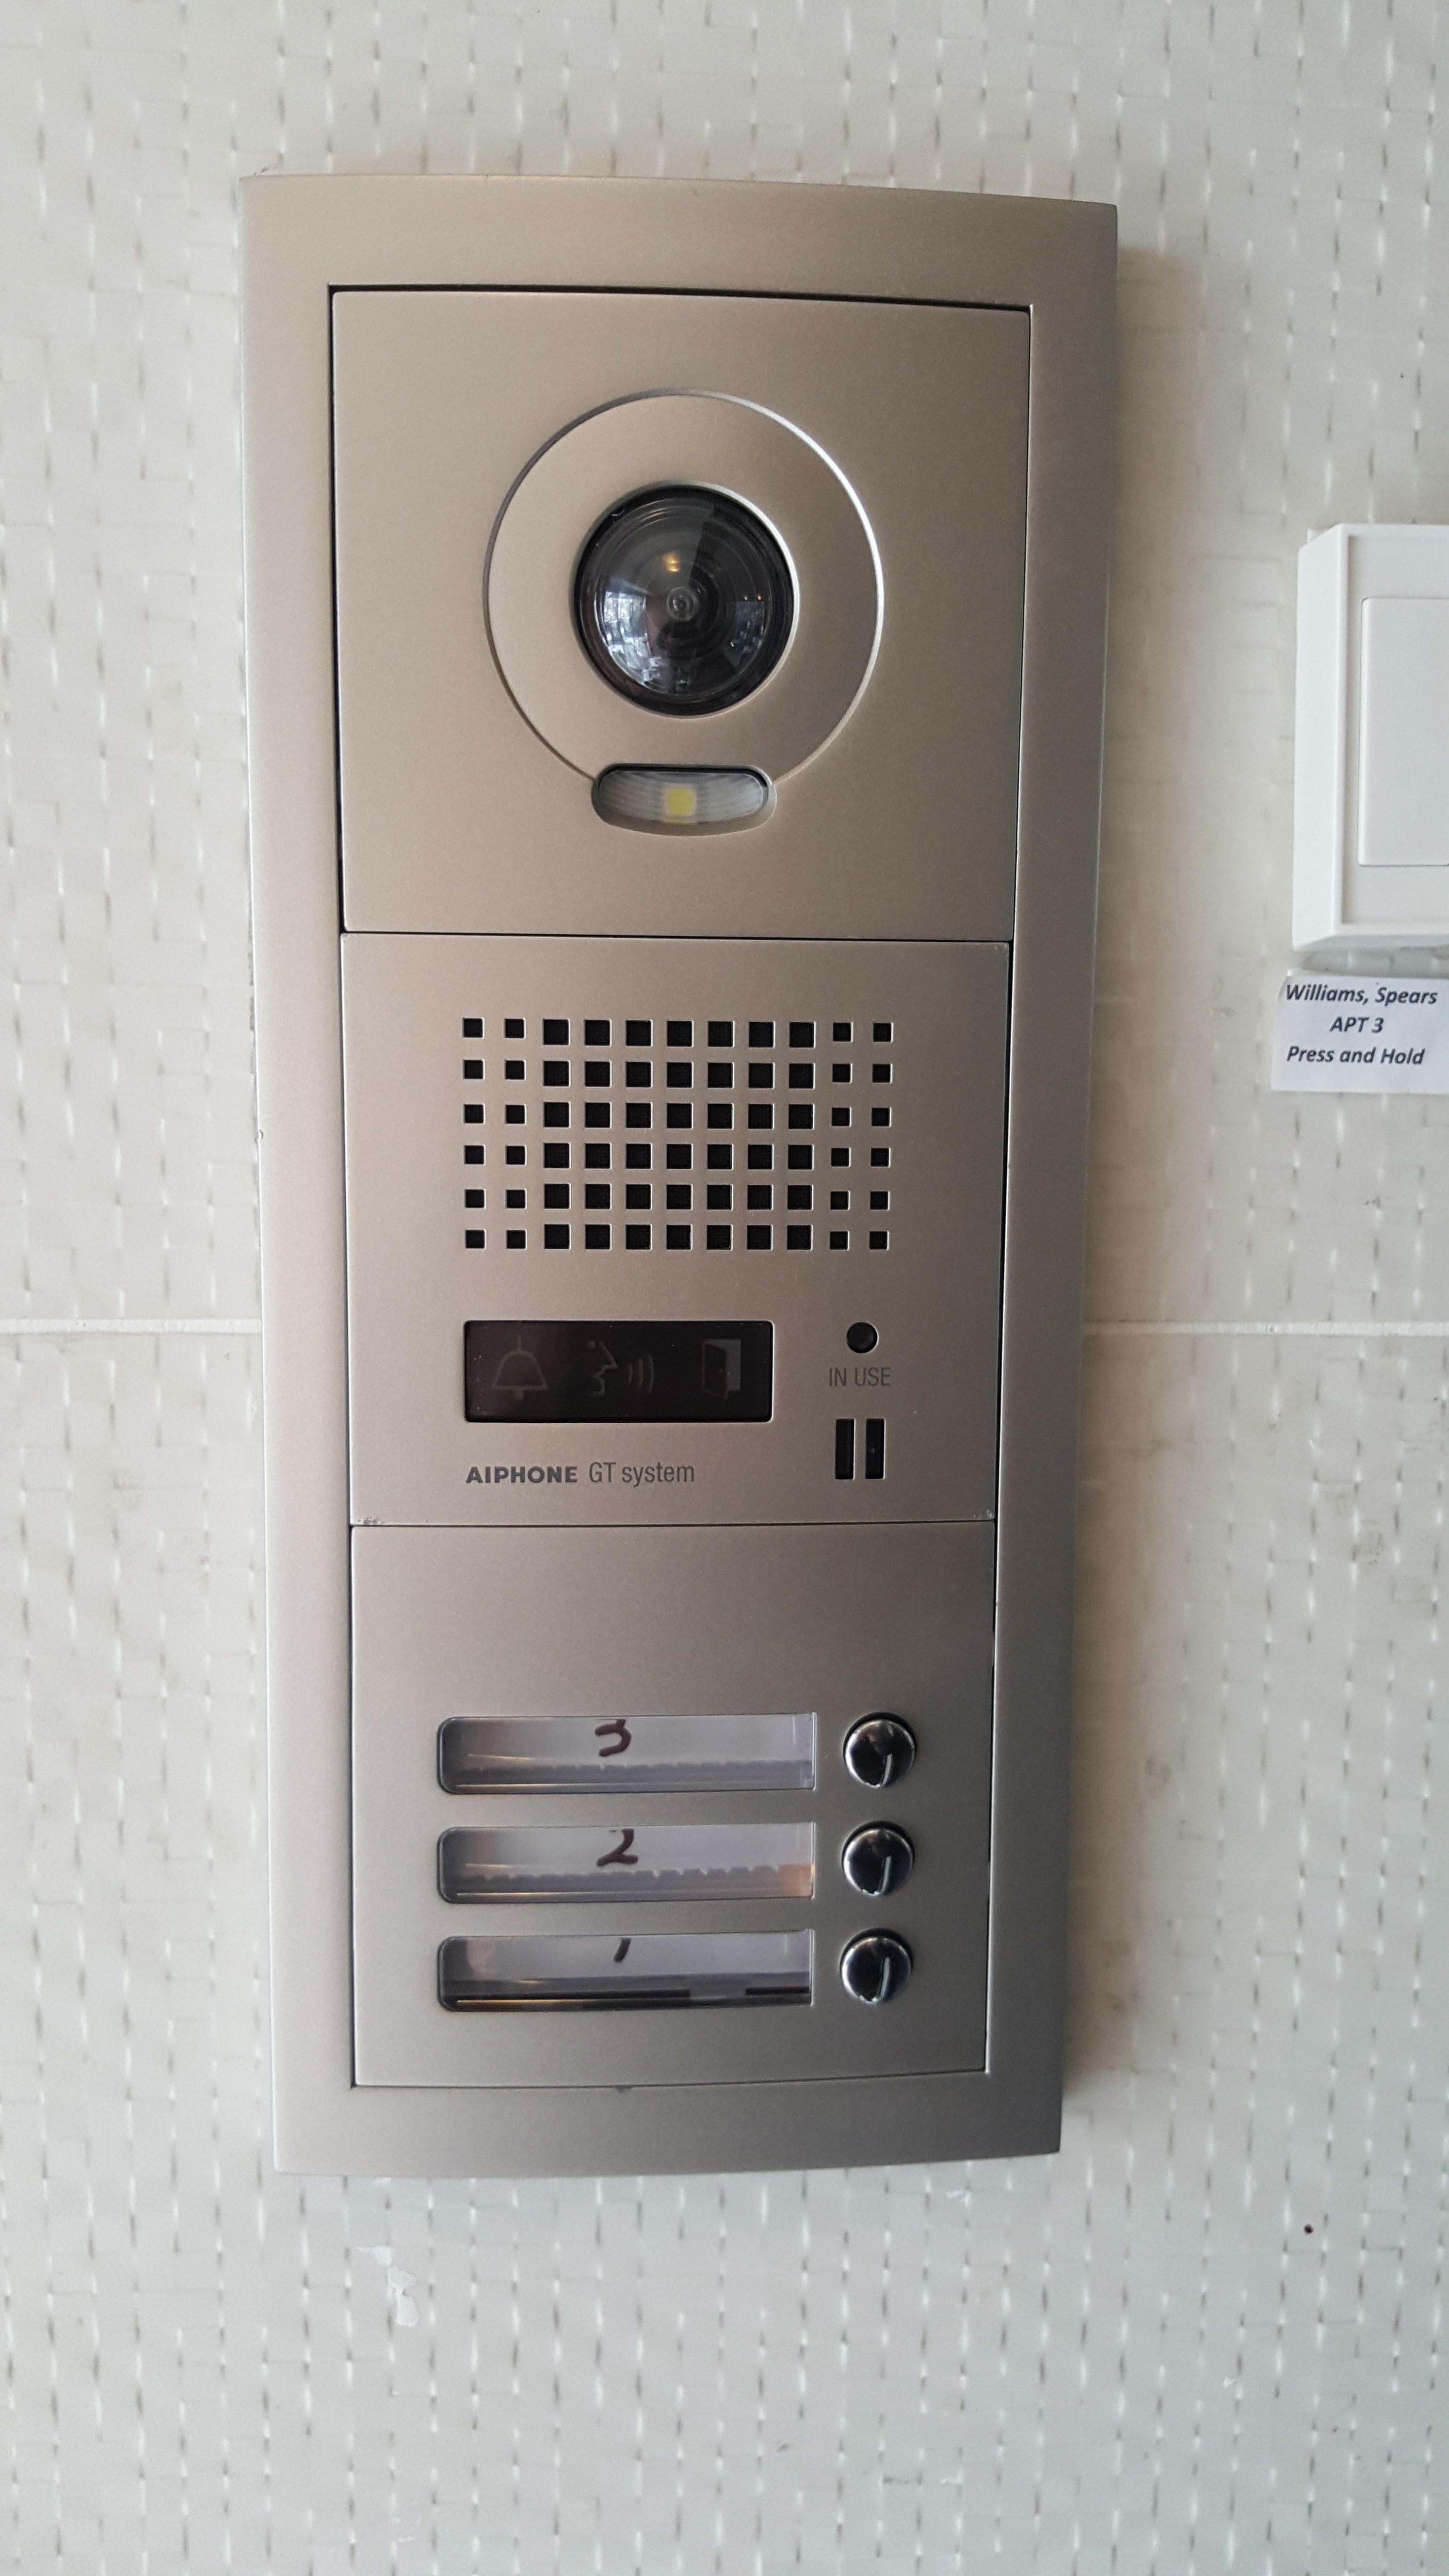 Installing intercom in the office 24